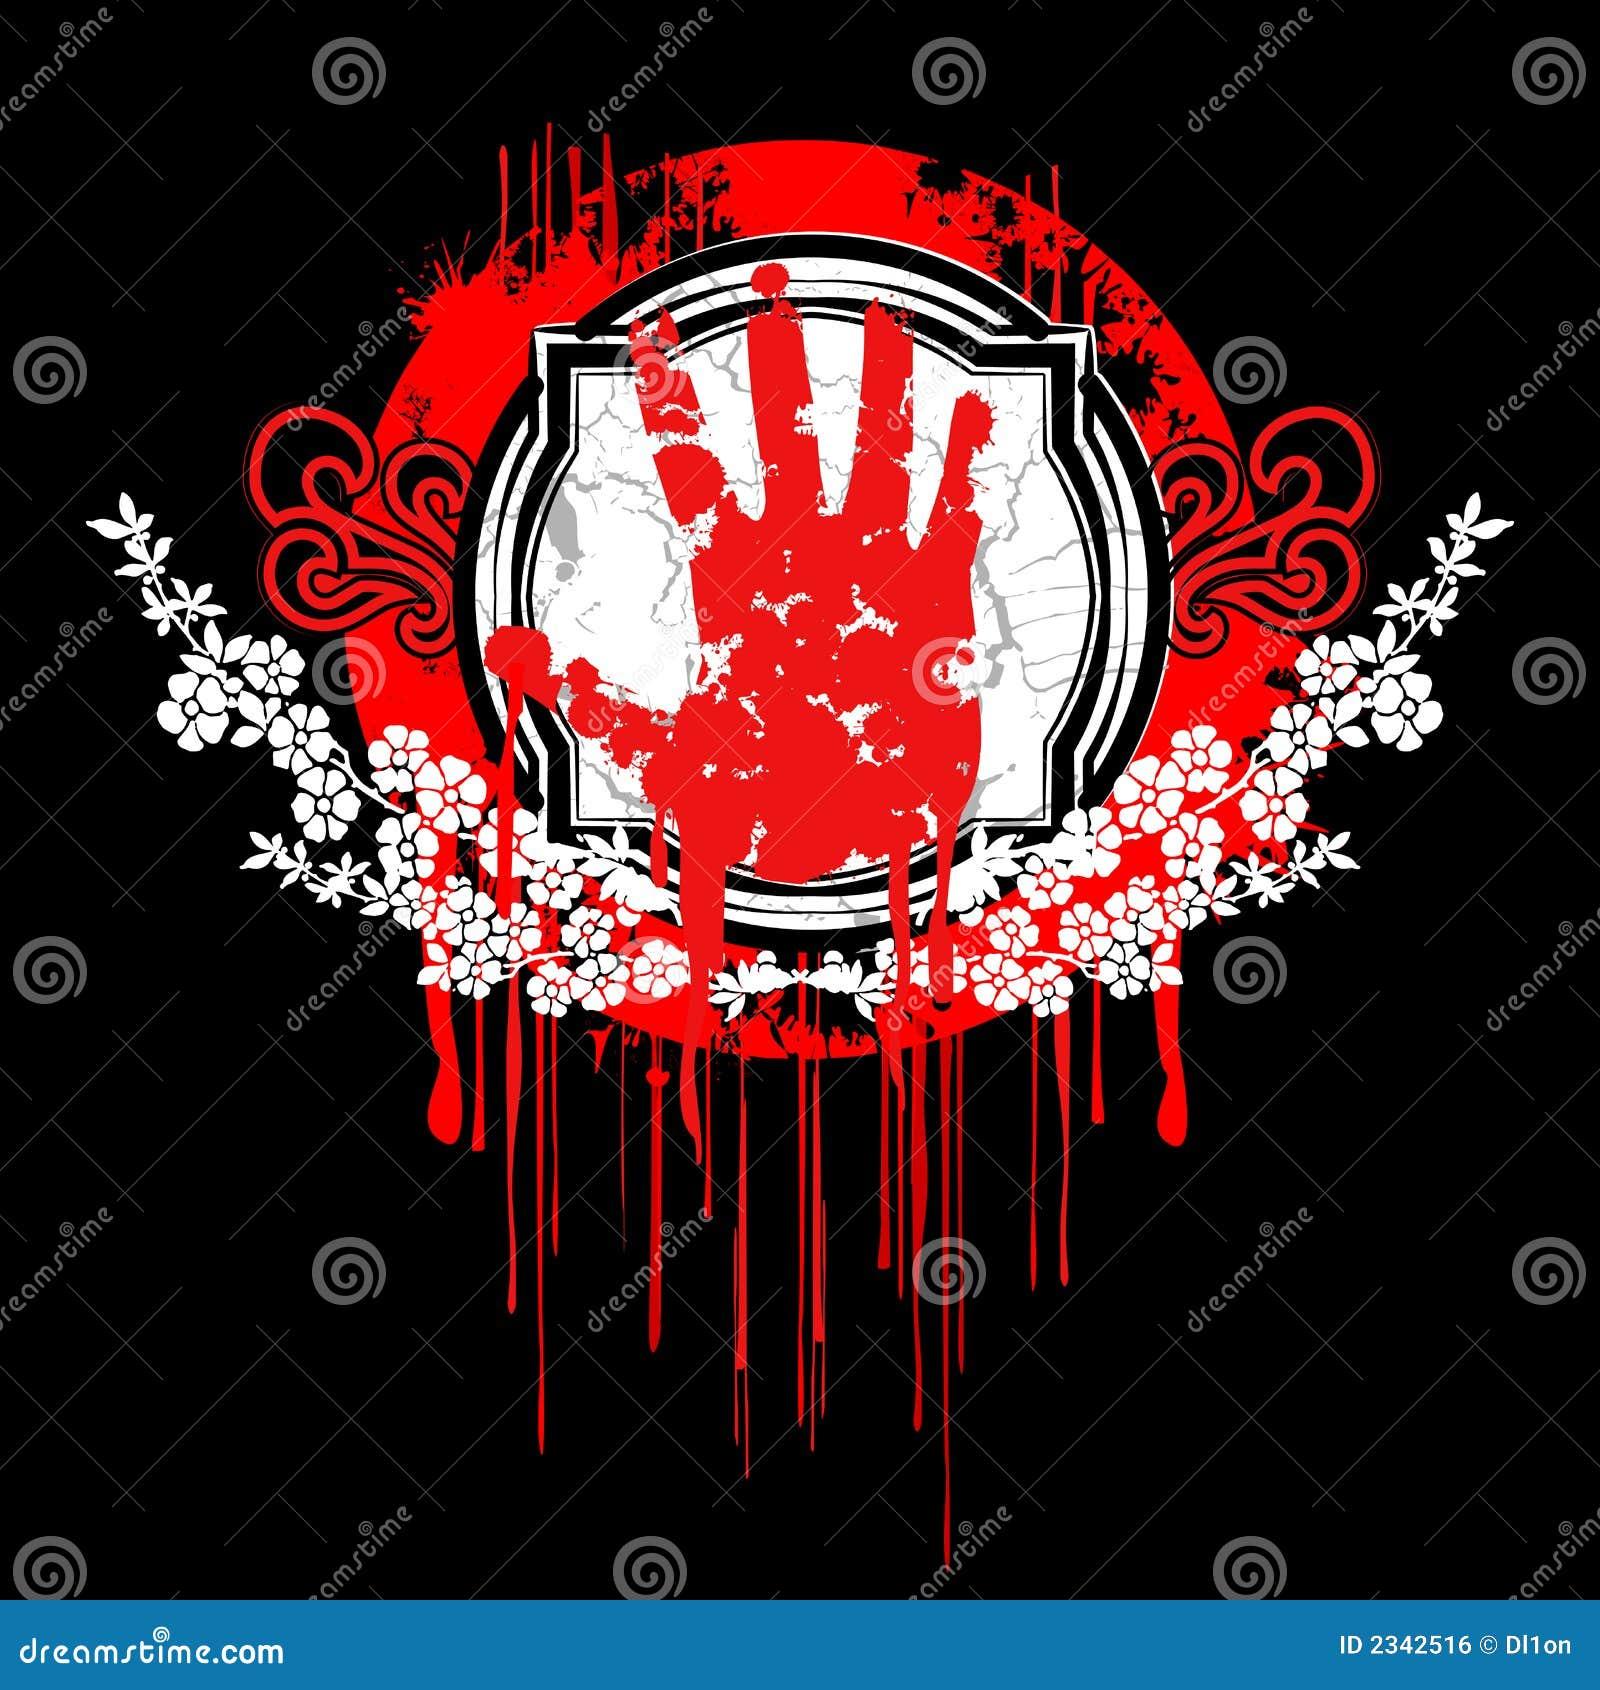 Blood Palm Hand Symbol. Royalty Free Stock Image - Image ...